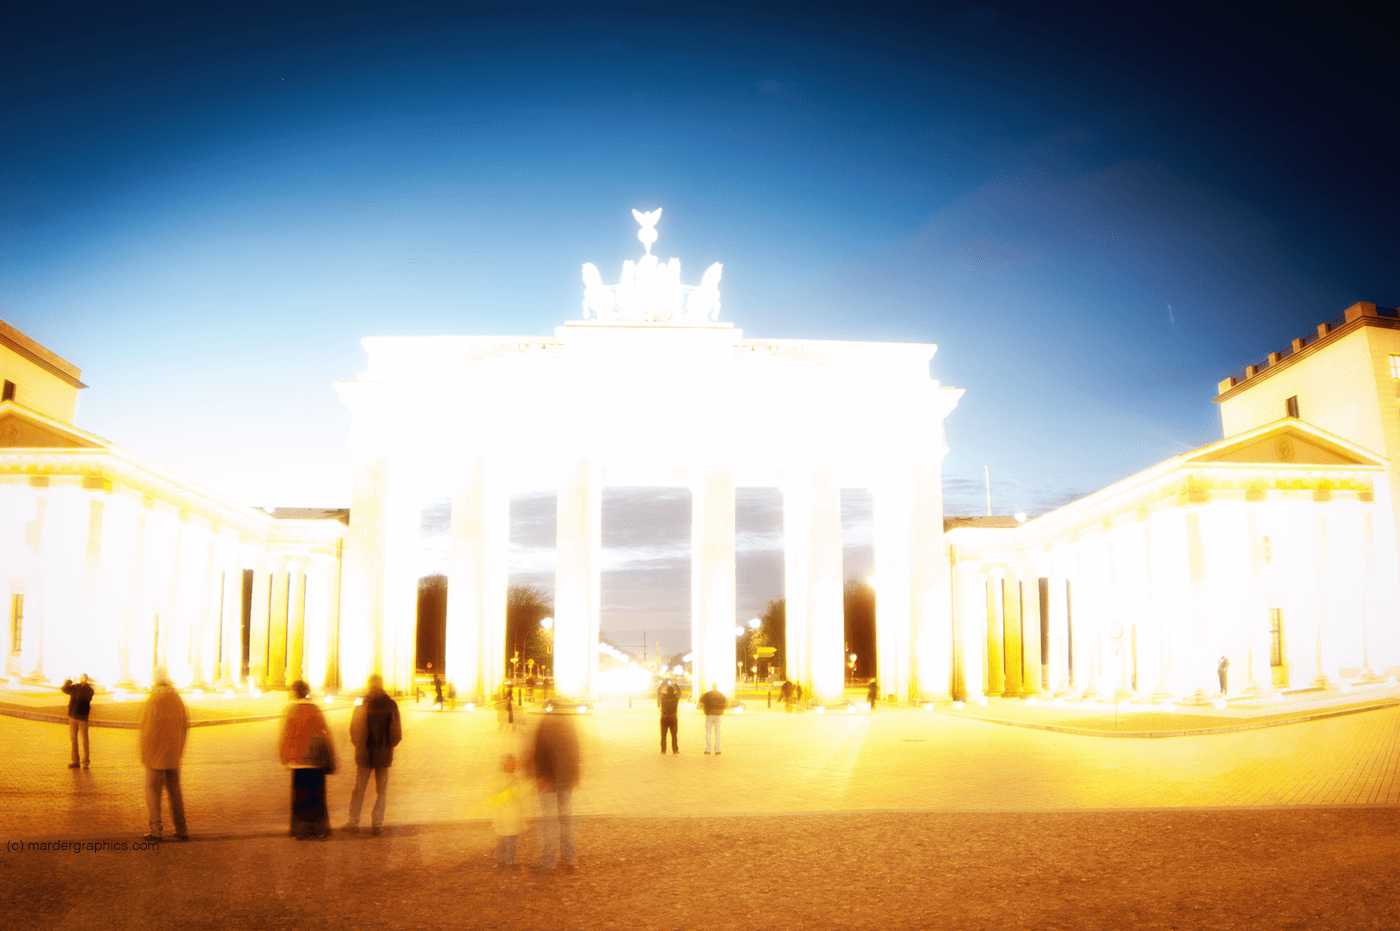 Brandenburger Tor, photo by mardergraphics